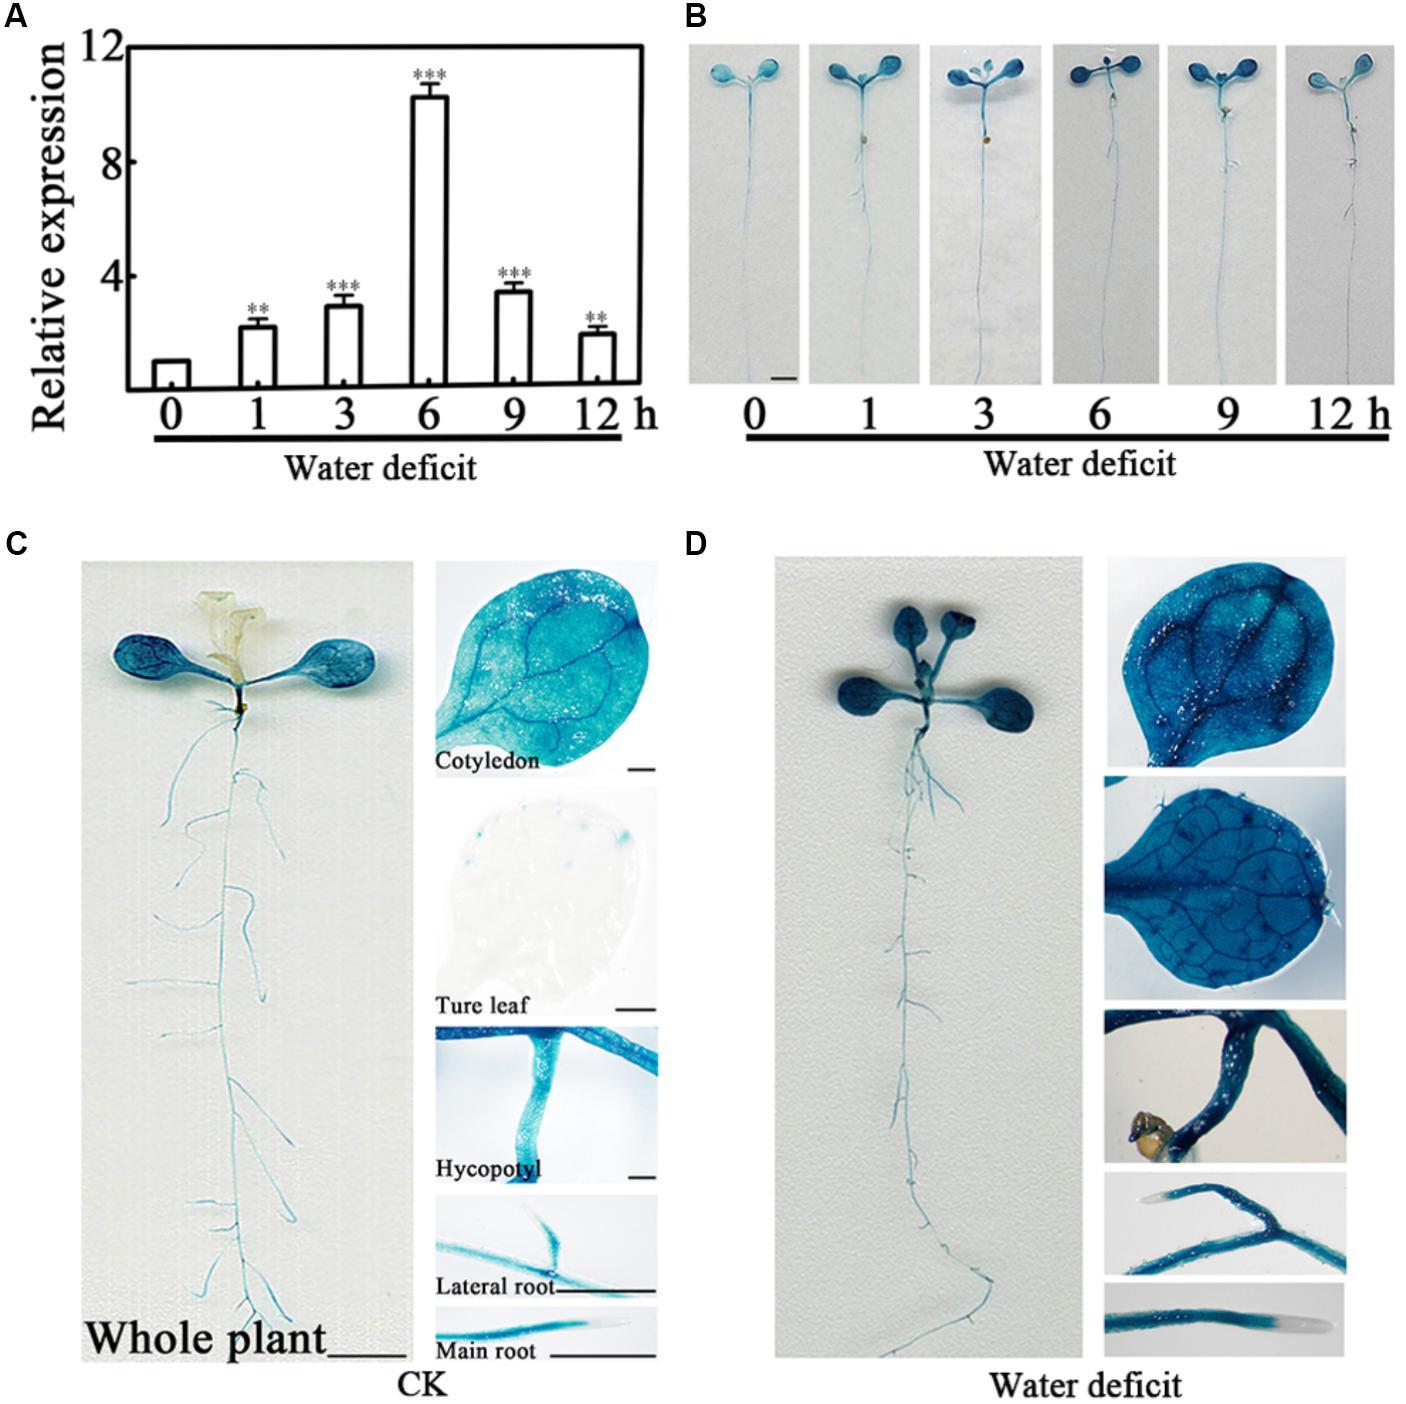 Frontiers | Arabidopsis PCaP2 Functions as a Linker Between